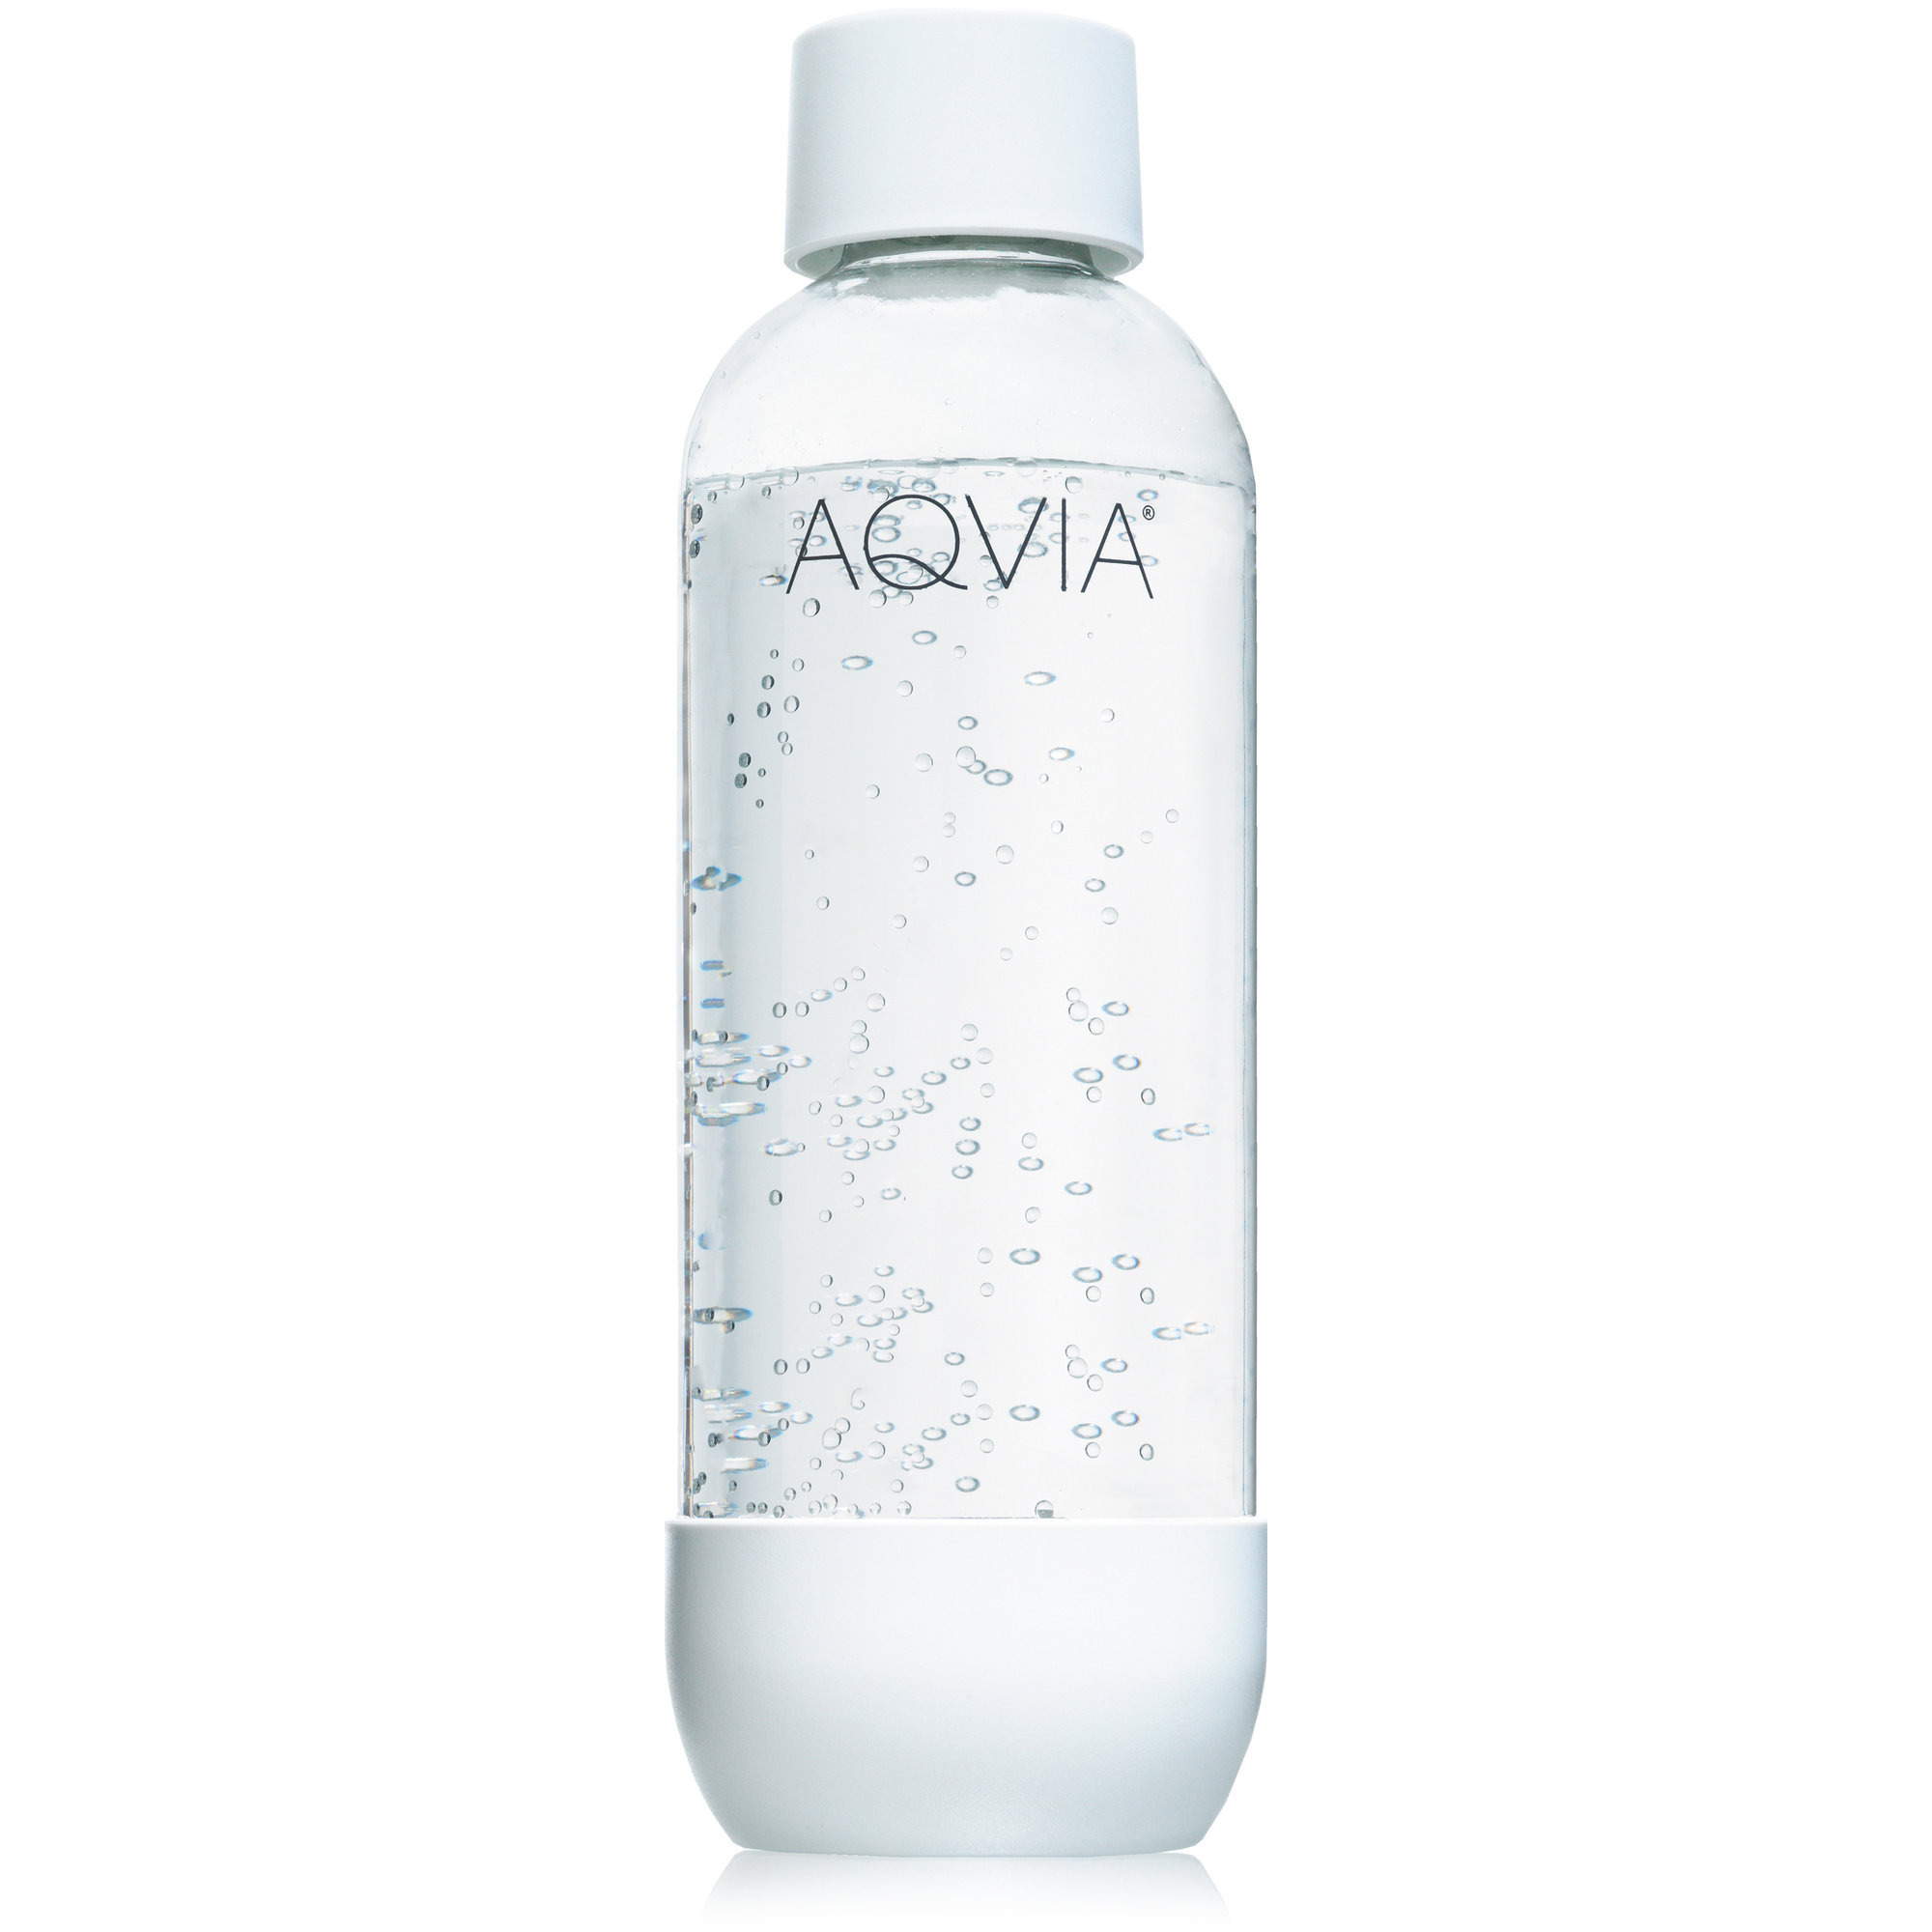 Aqvia Vattenflaska 1 000 ml. Vit